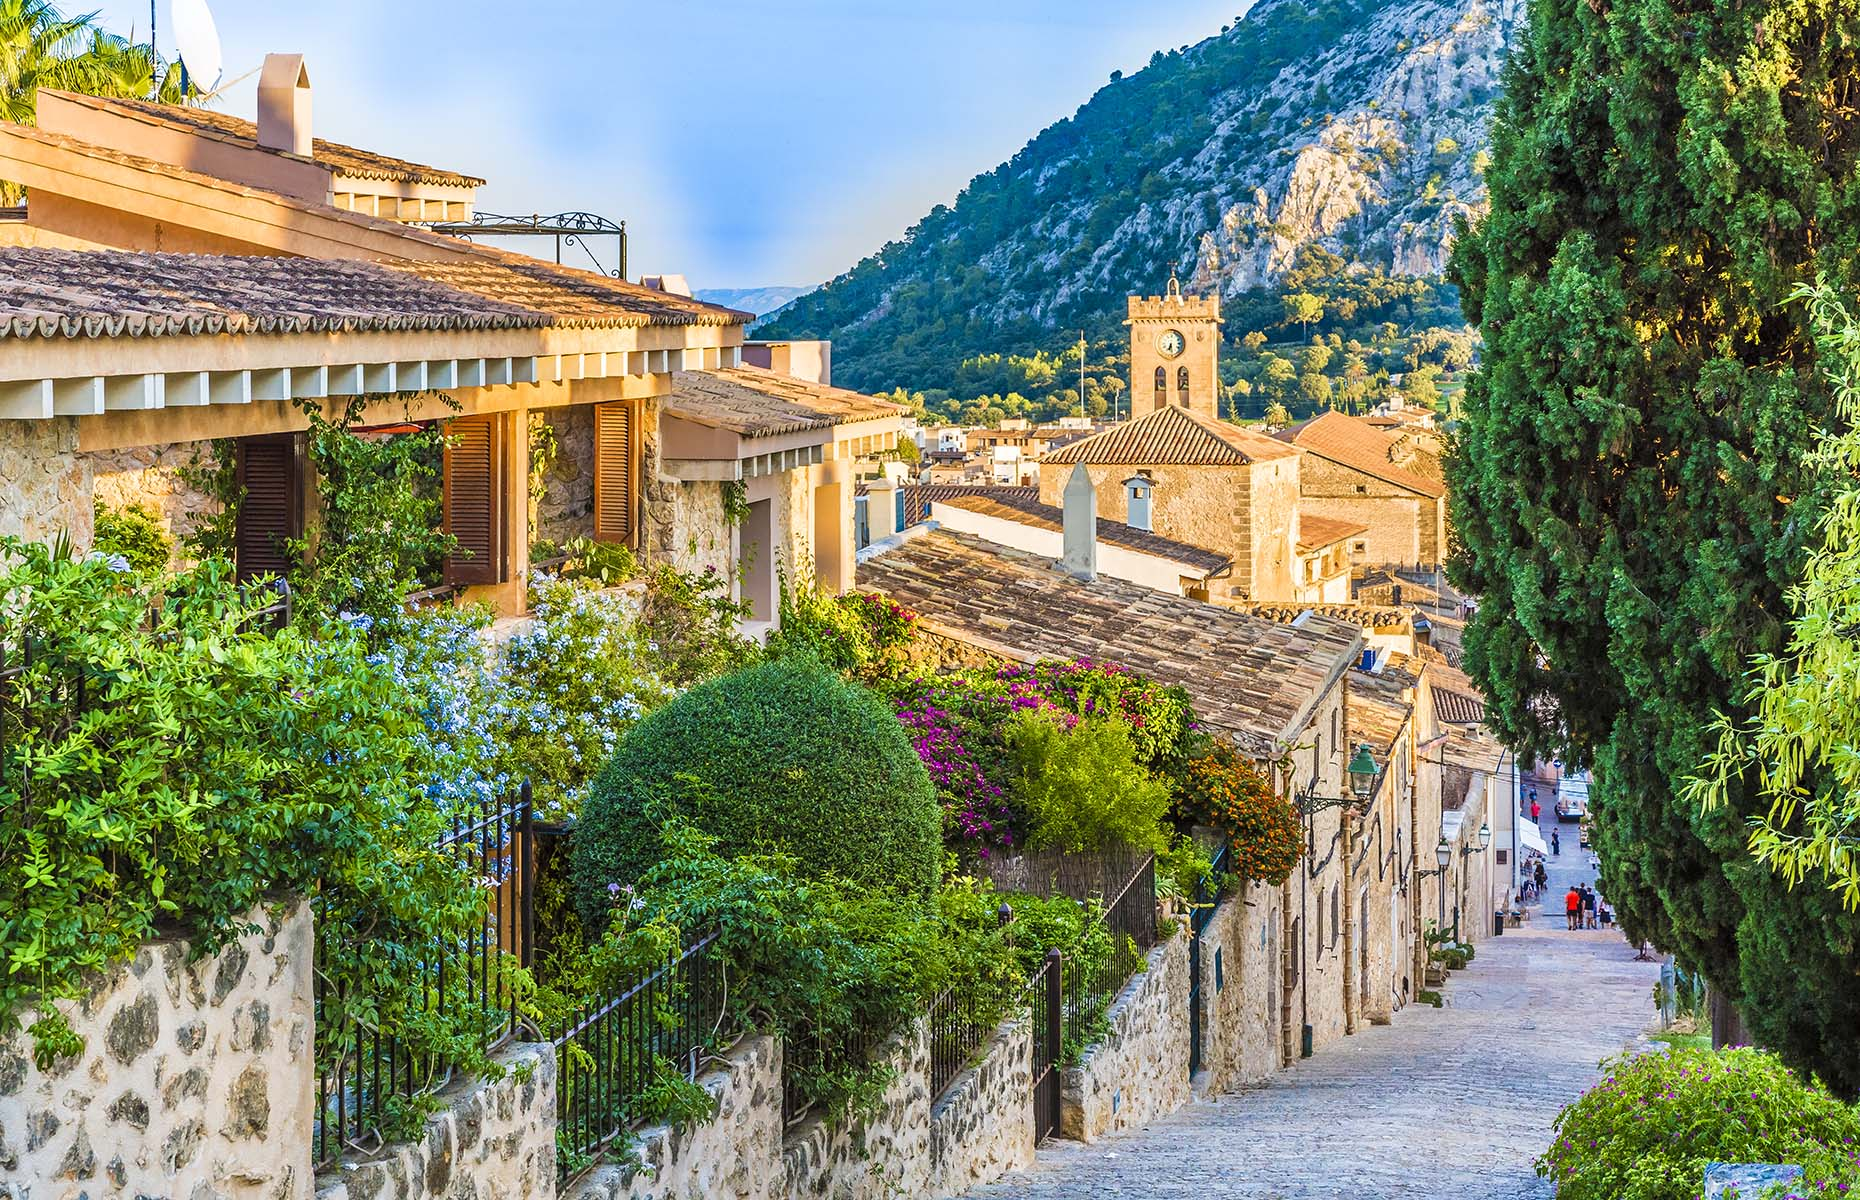 Calvari Steps in Pollenca, Mallorca (Image: Balate Dorin/Shutterstock)